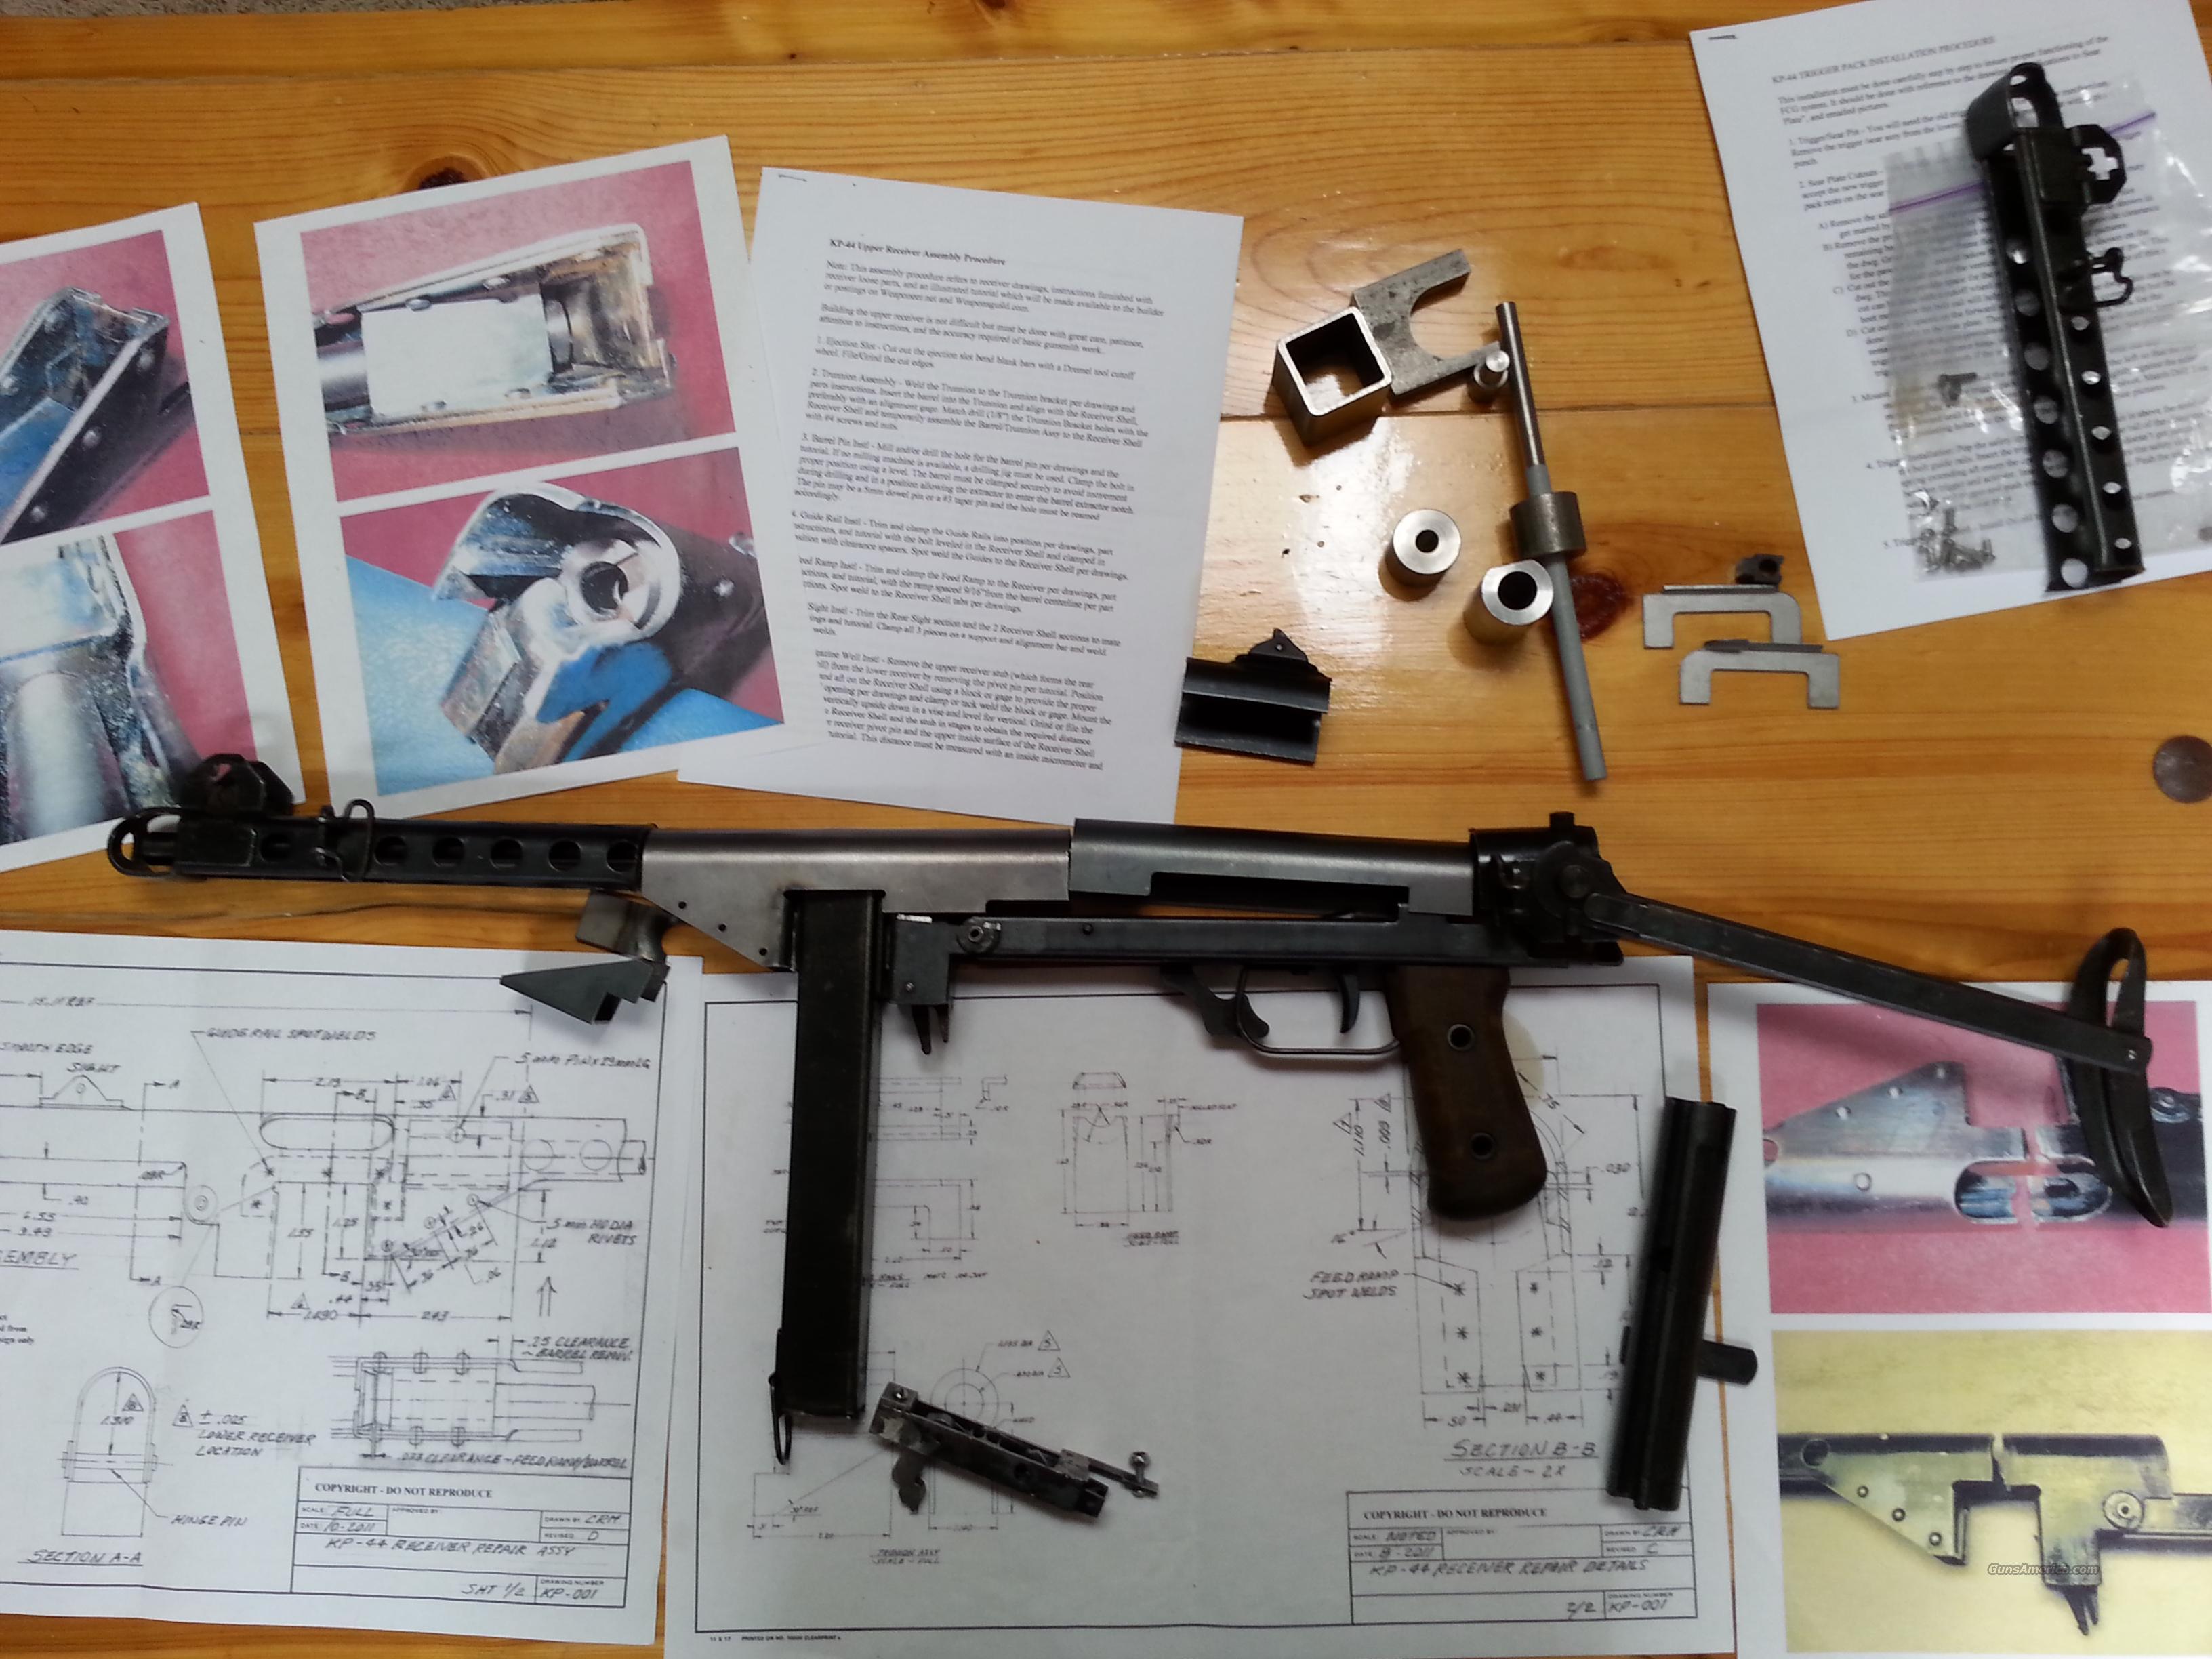 WW2 Suomi KP 44 Complete build kit